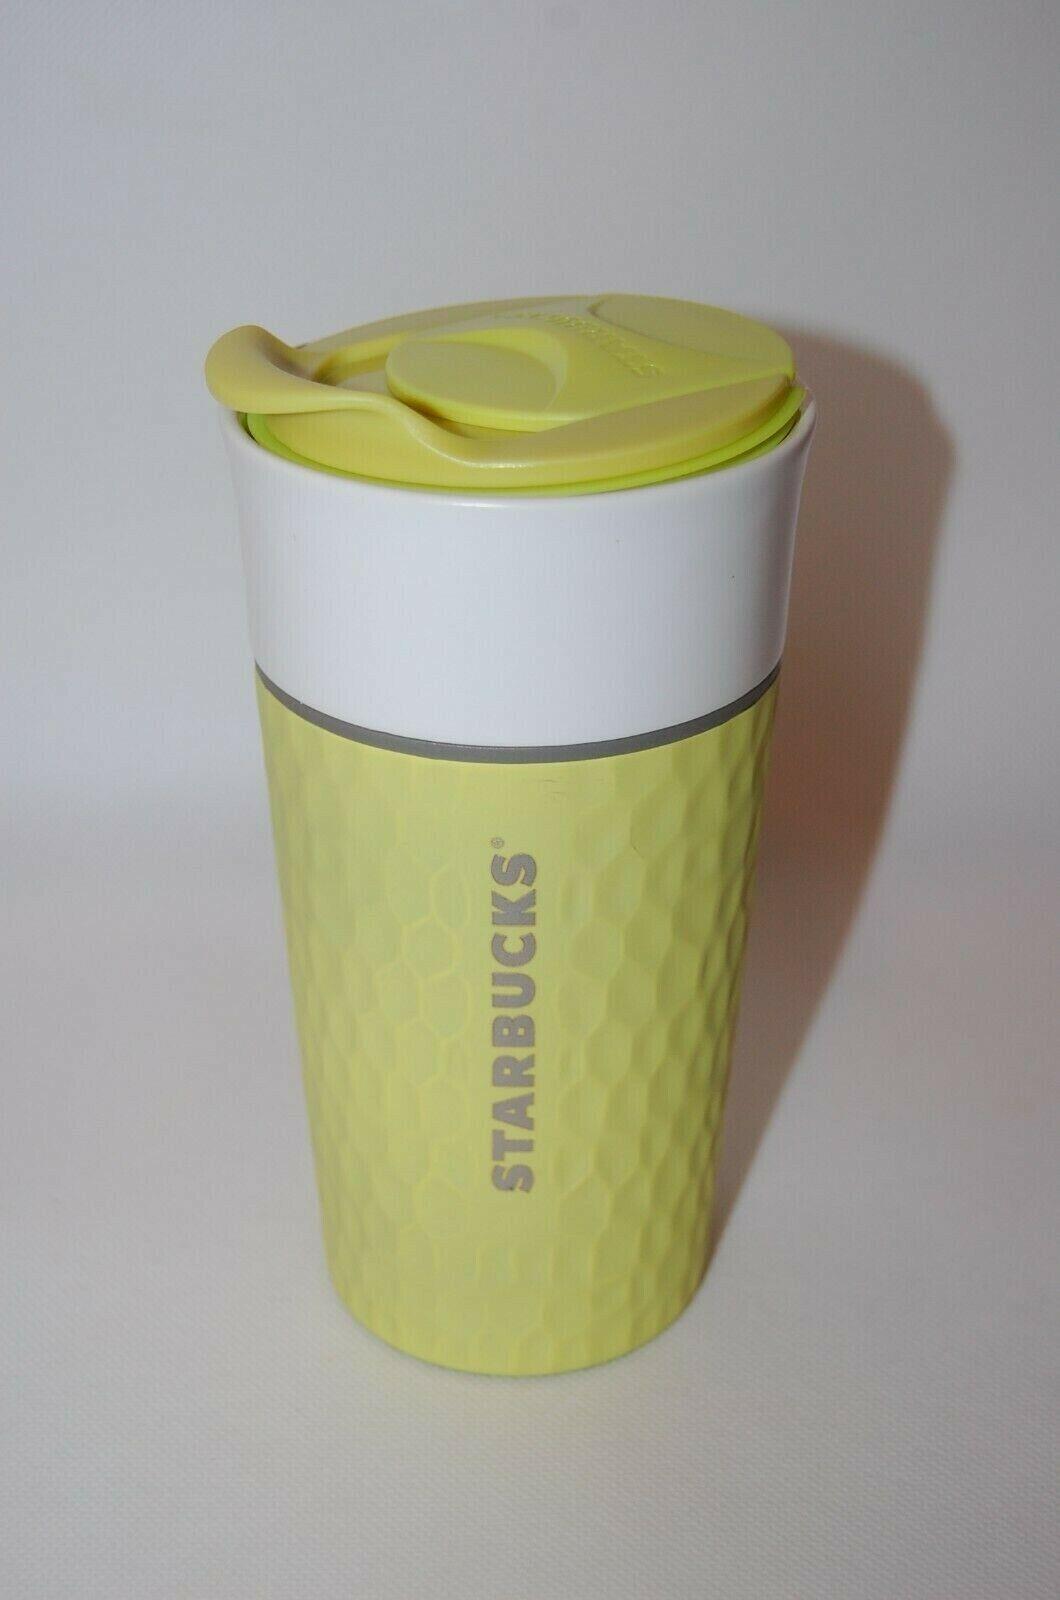 ceramic insulated textured travel tumbler cup 12